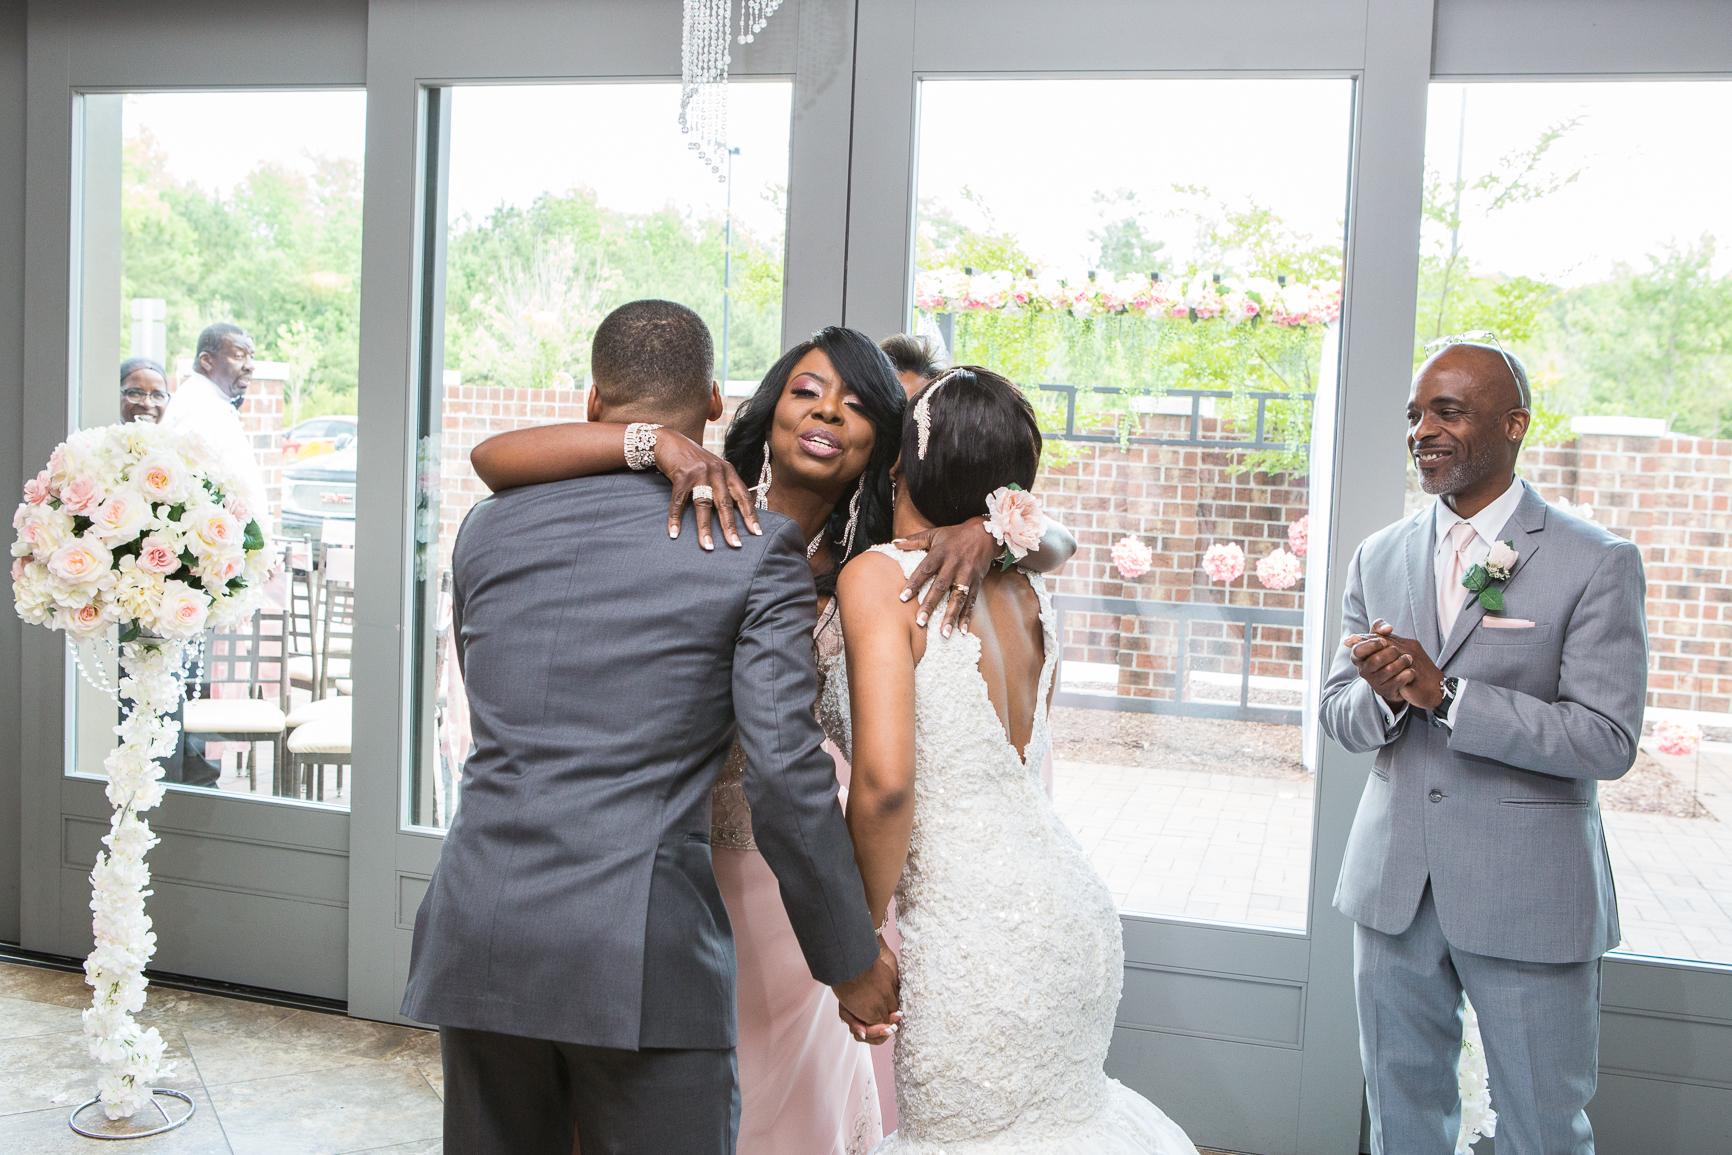 Noah Raleigh wedding photographer - 101 studio llc -17.jpg